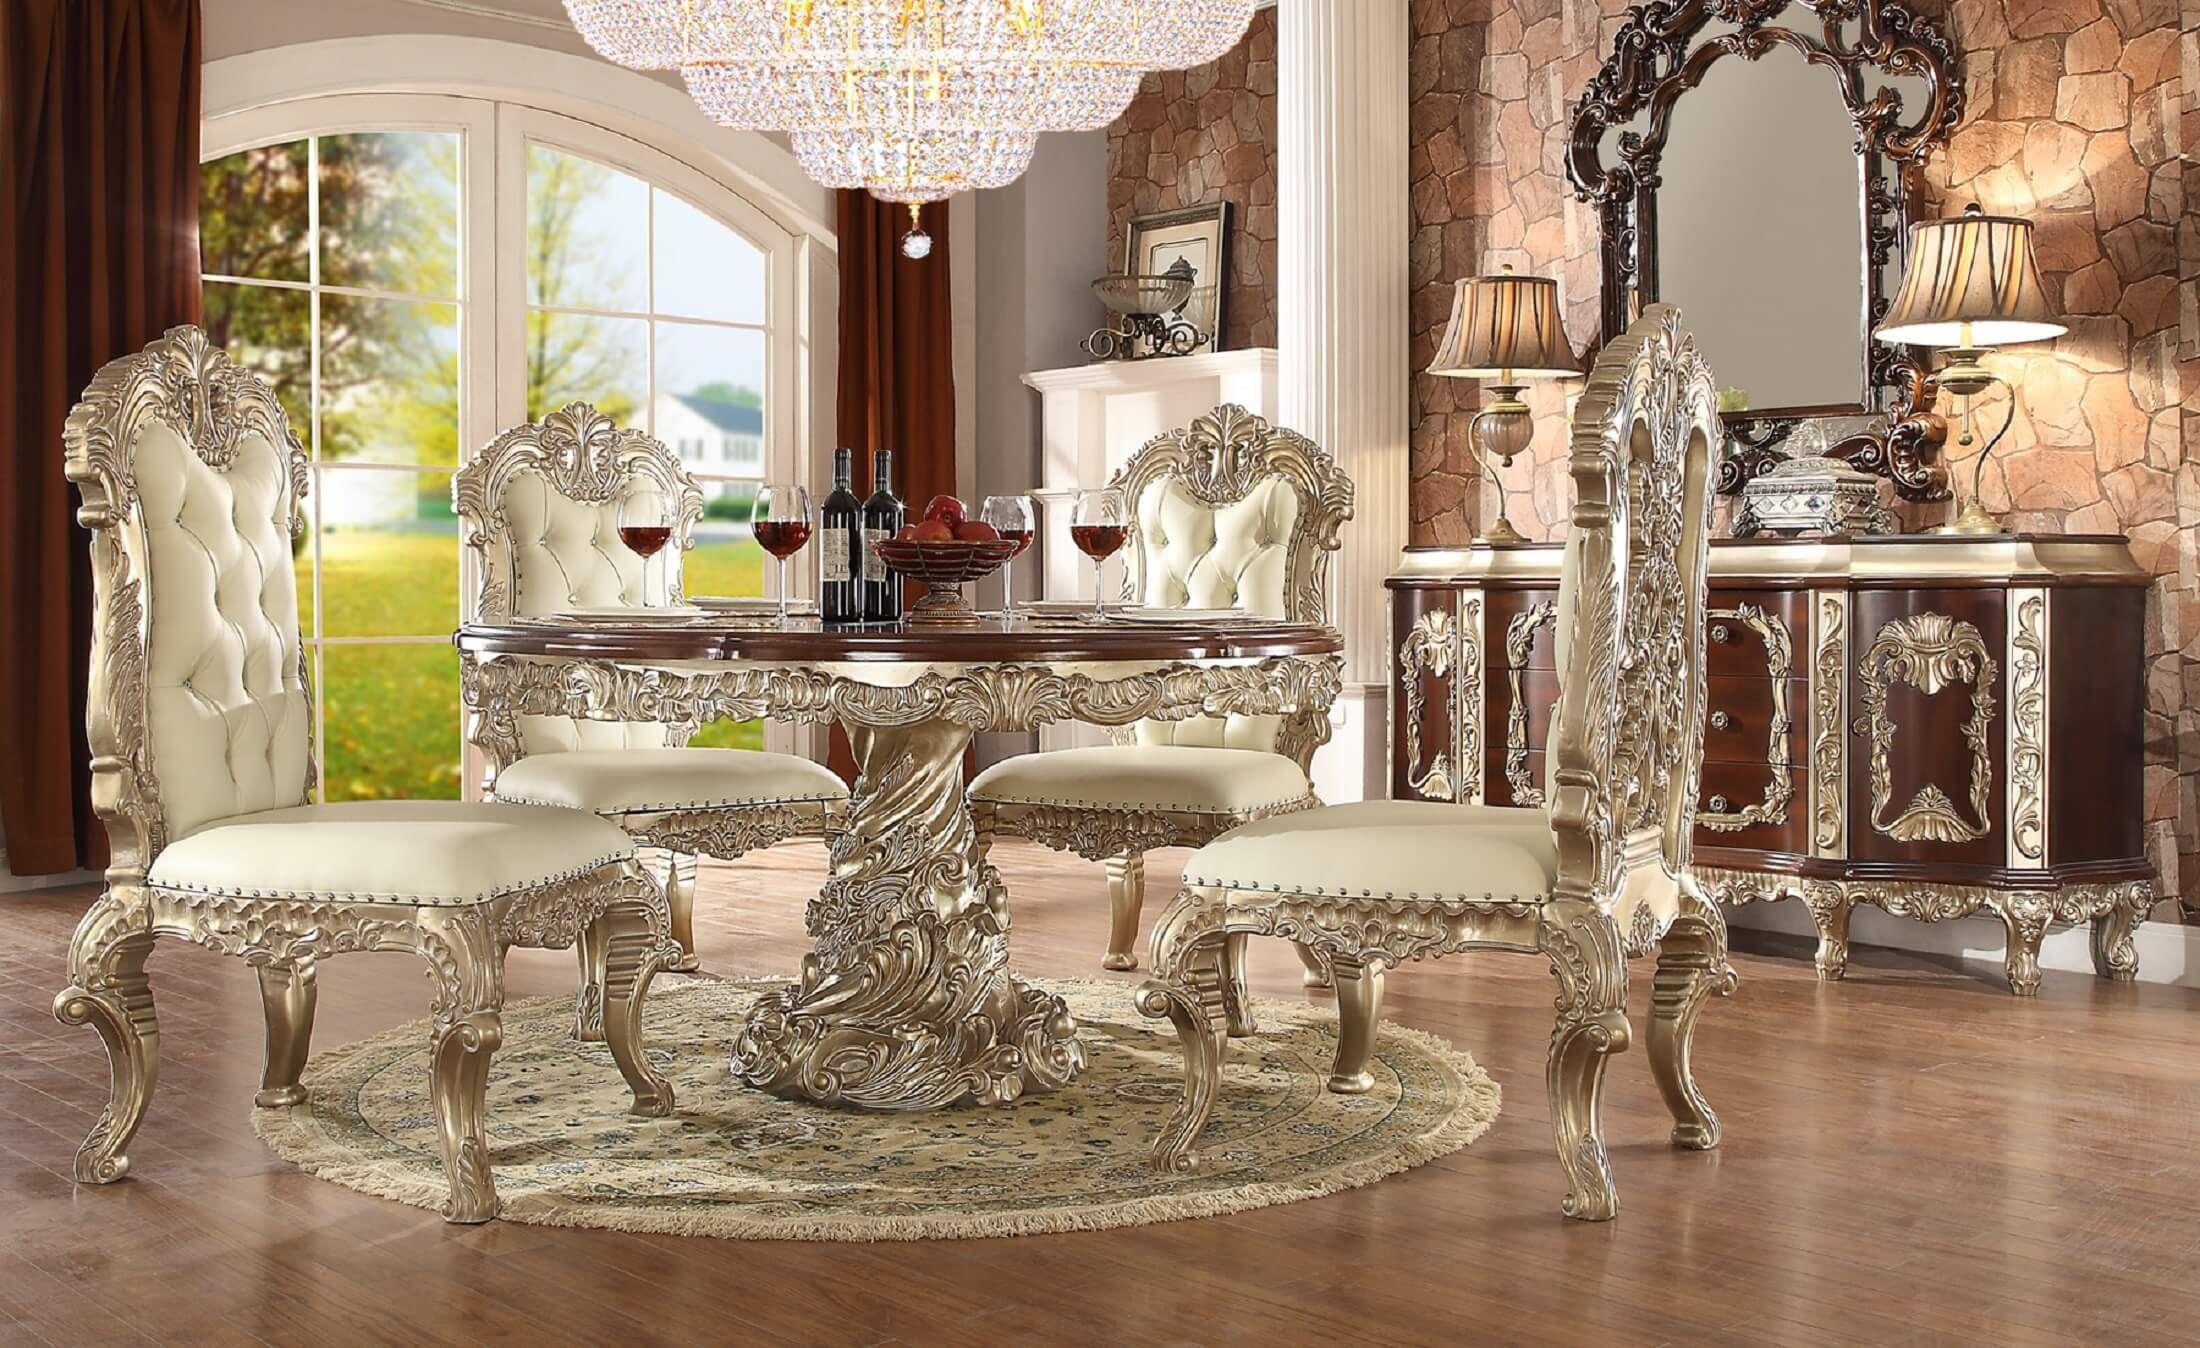 Homey Design Hd 8017 Cleopatra Round Dining Set Round Dining